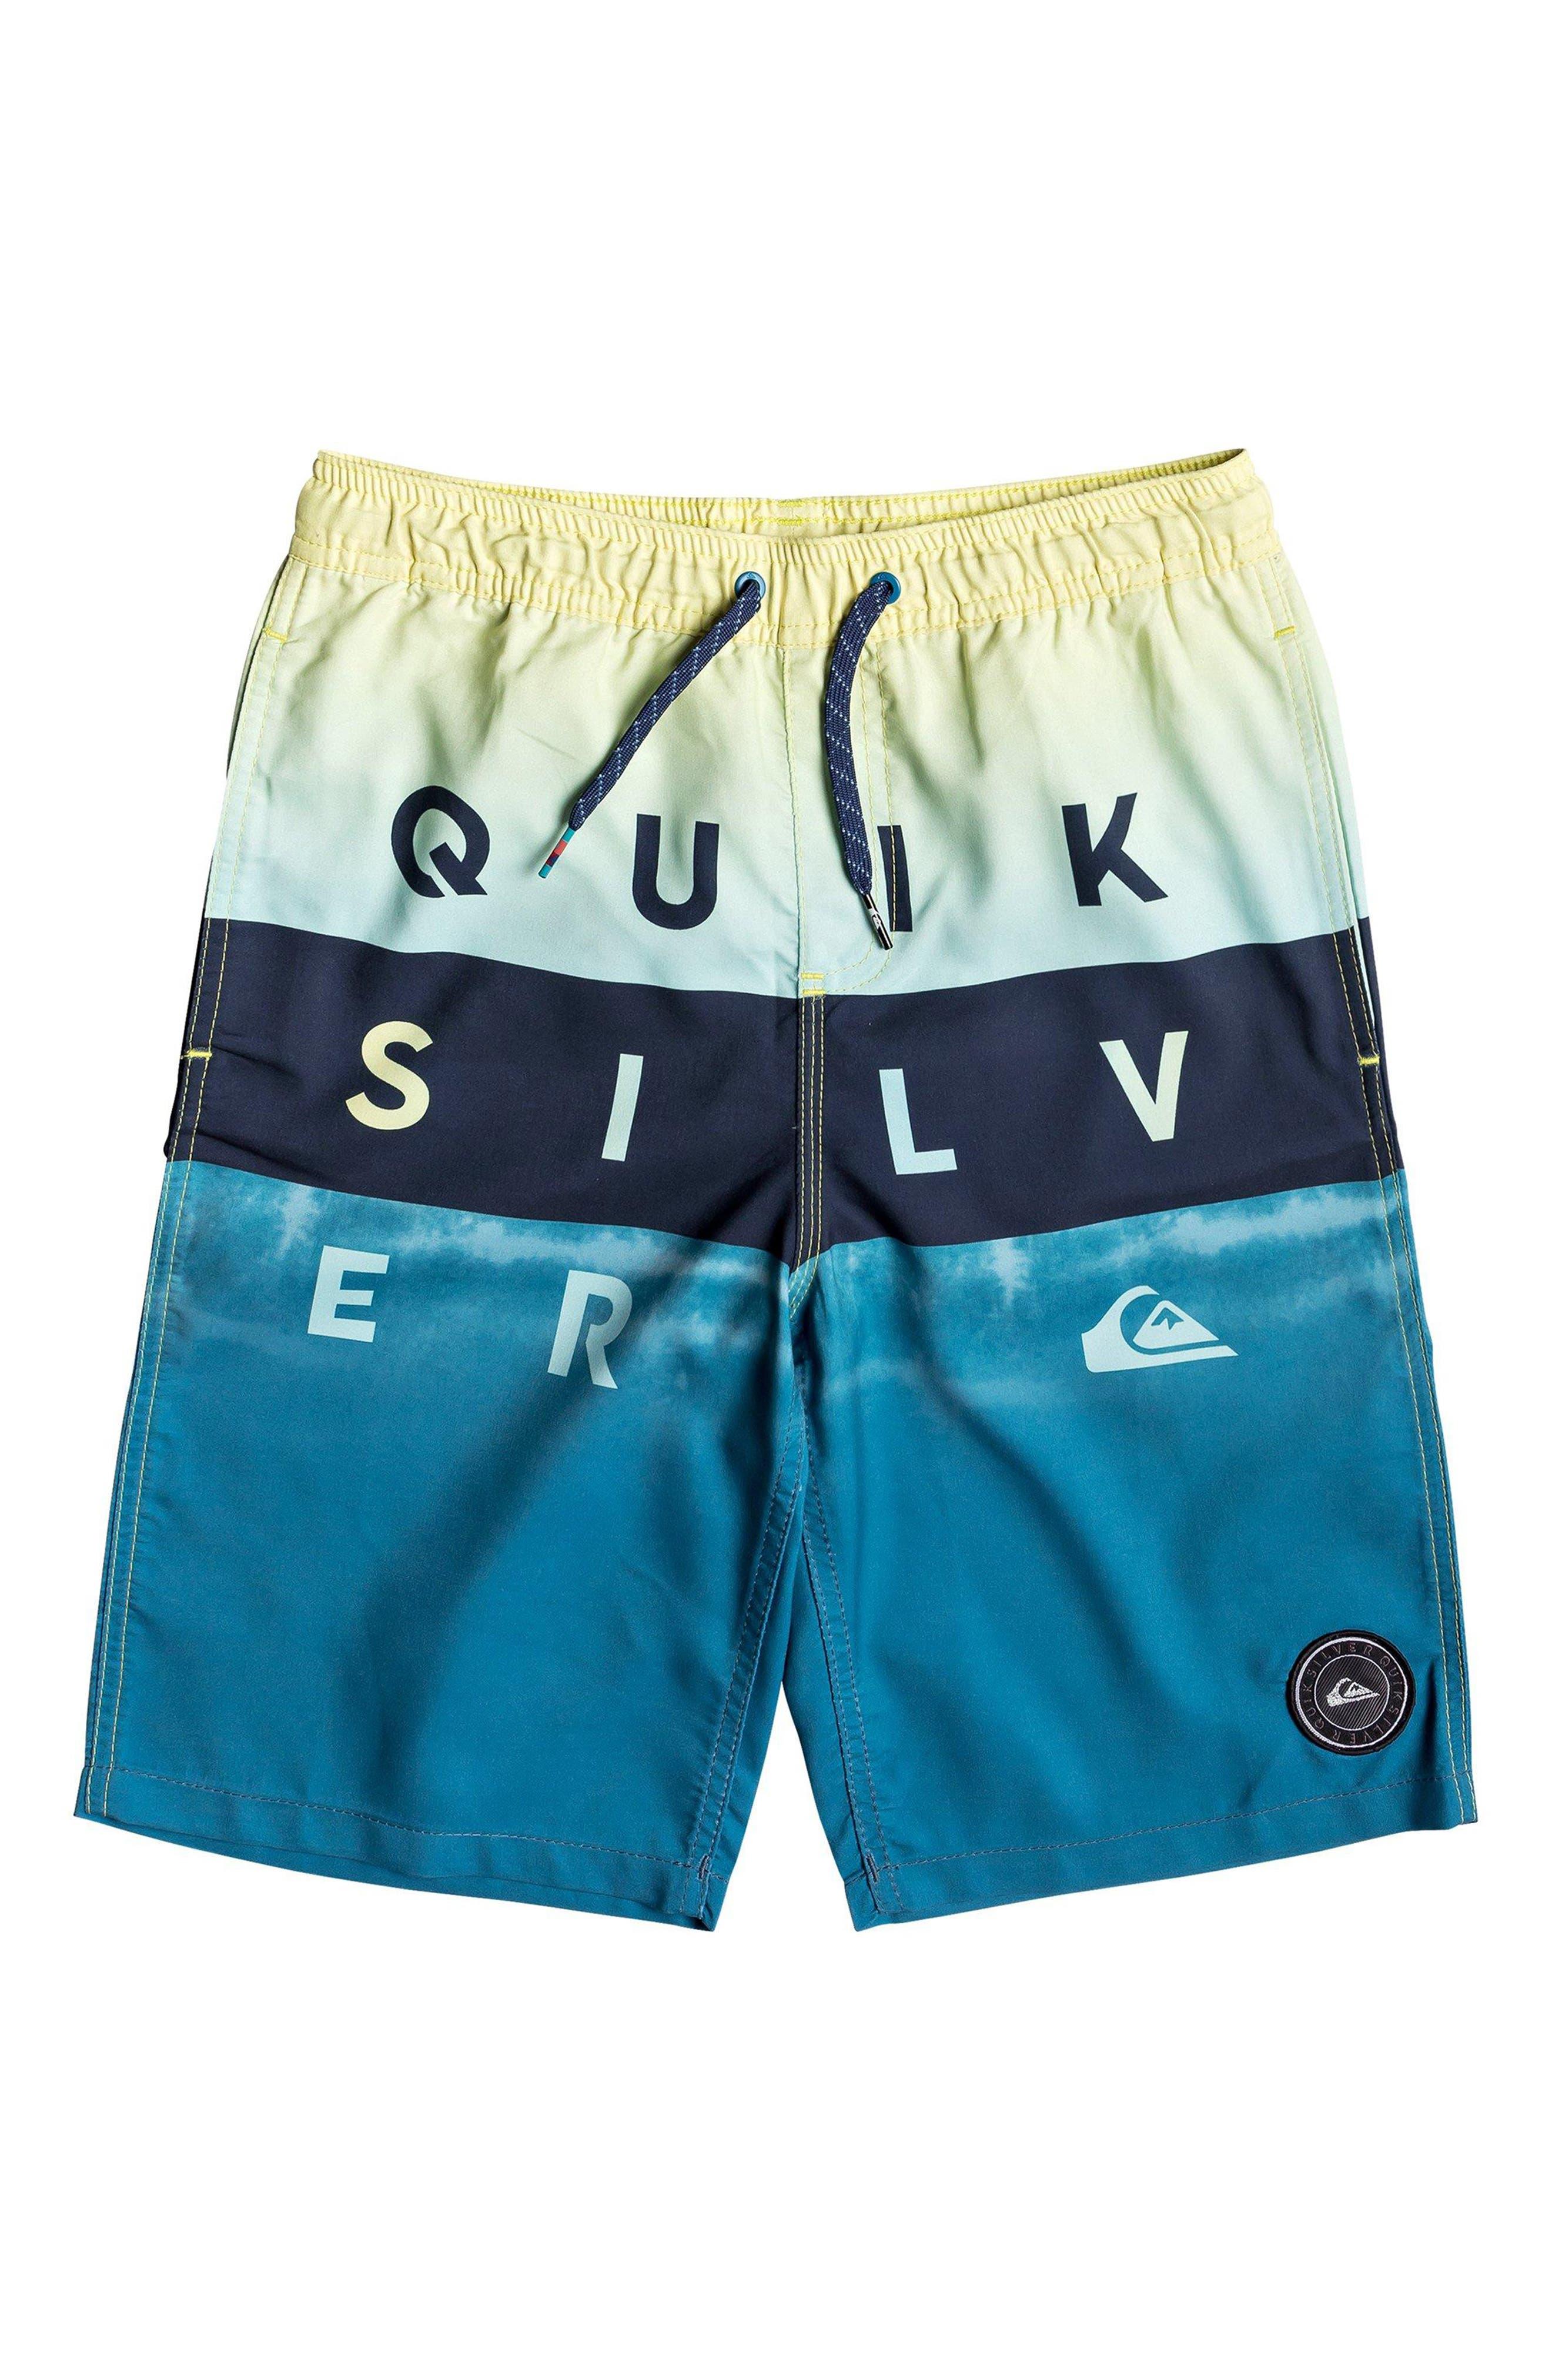 18693dca4f Boy's Quiksilver Word Block Volley Swim Trunks, Size L (14) - Blue